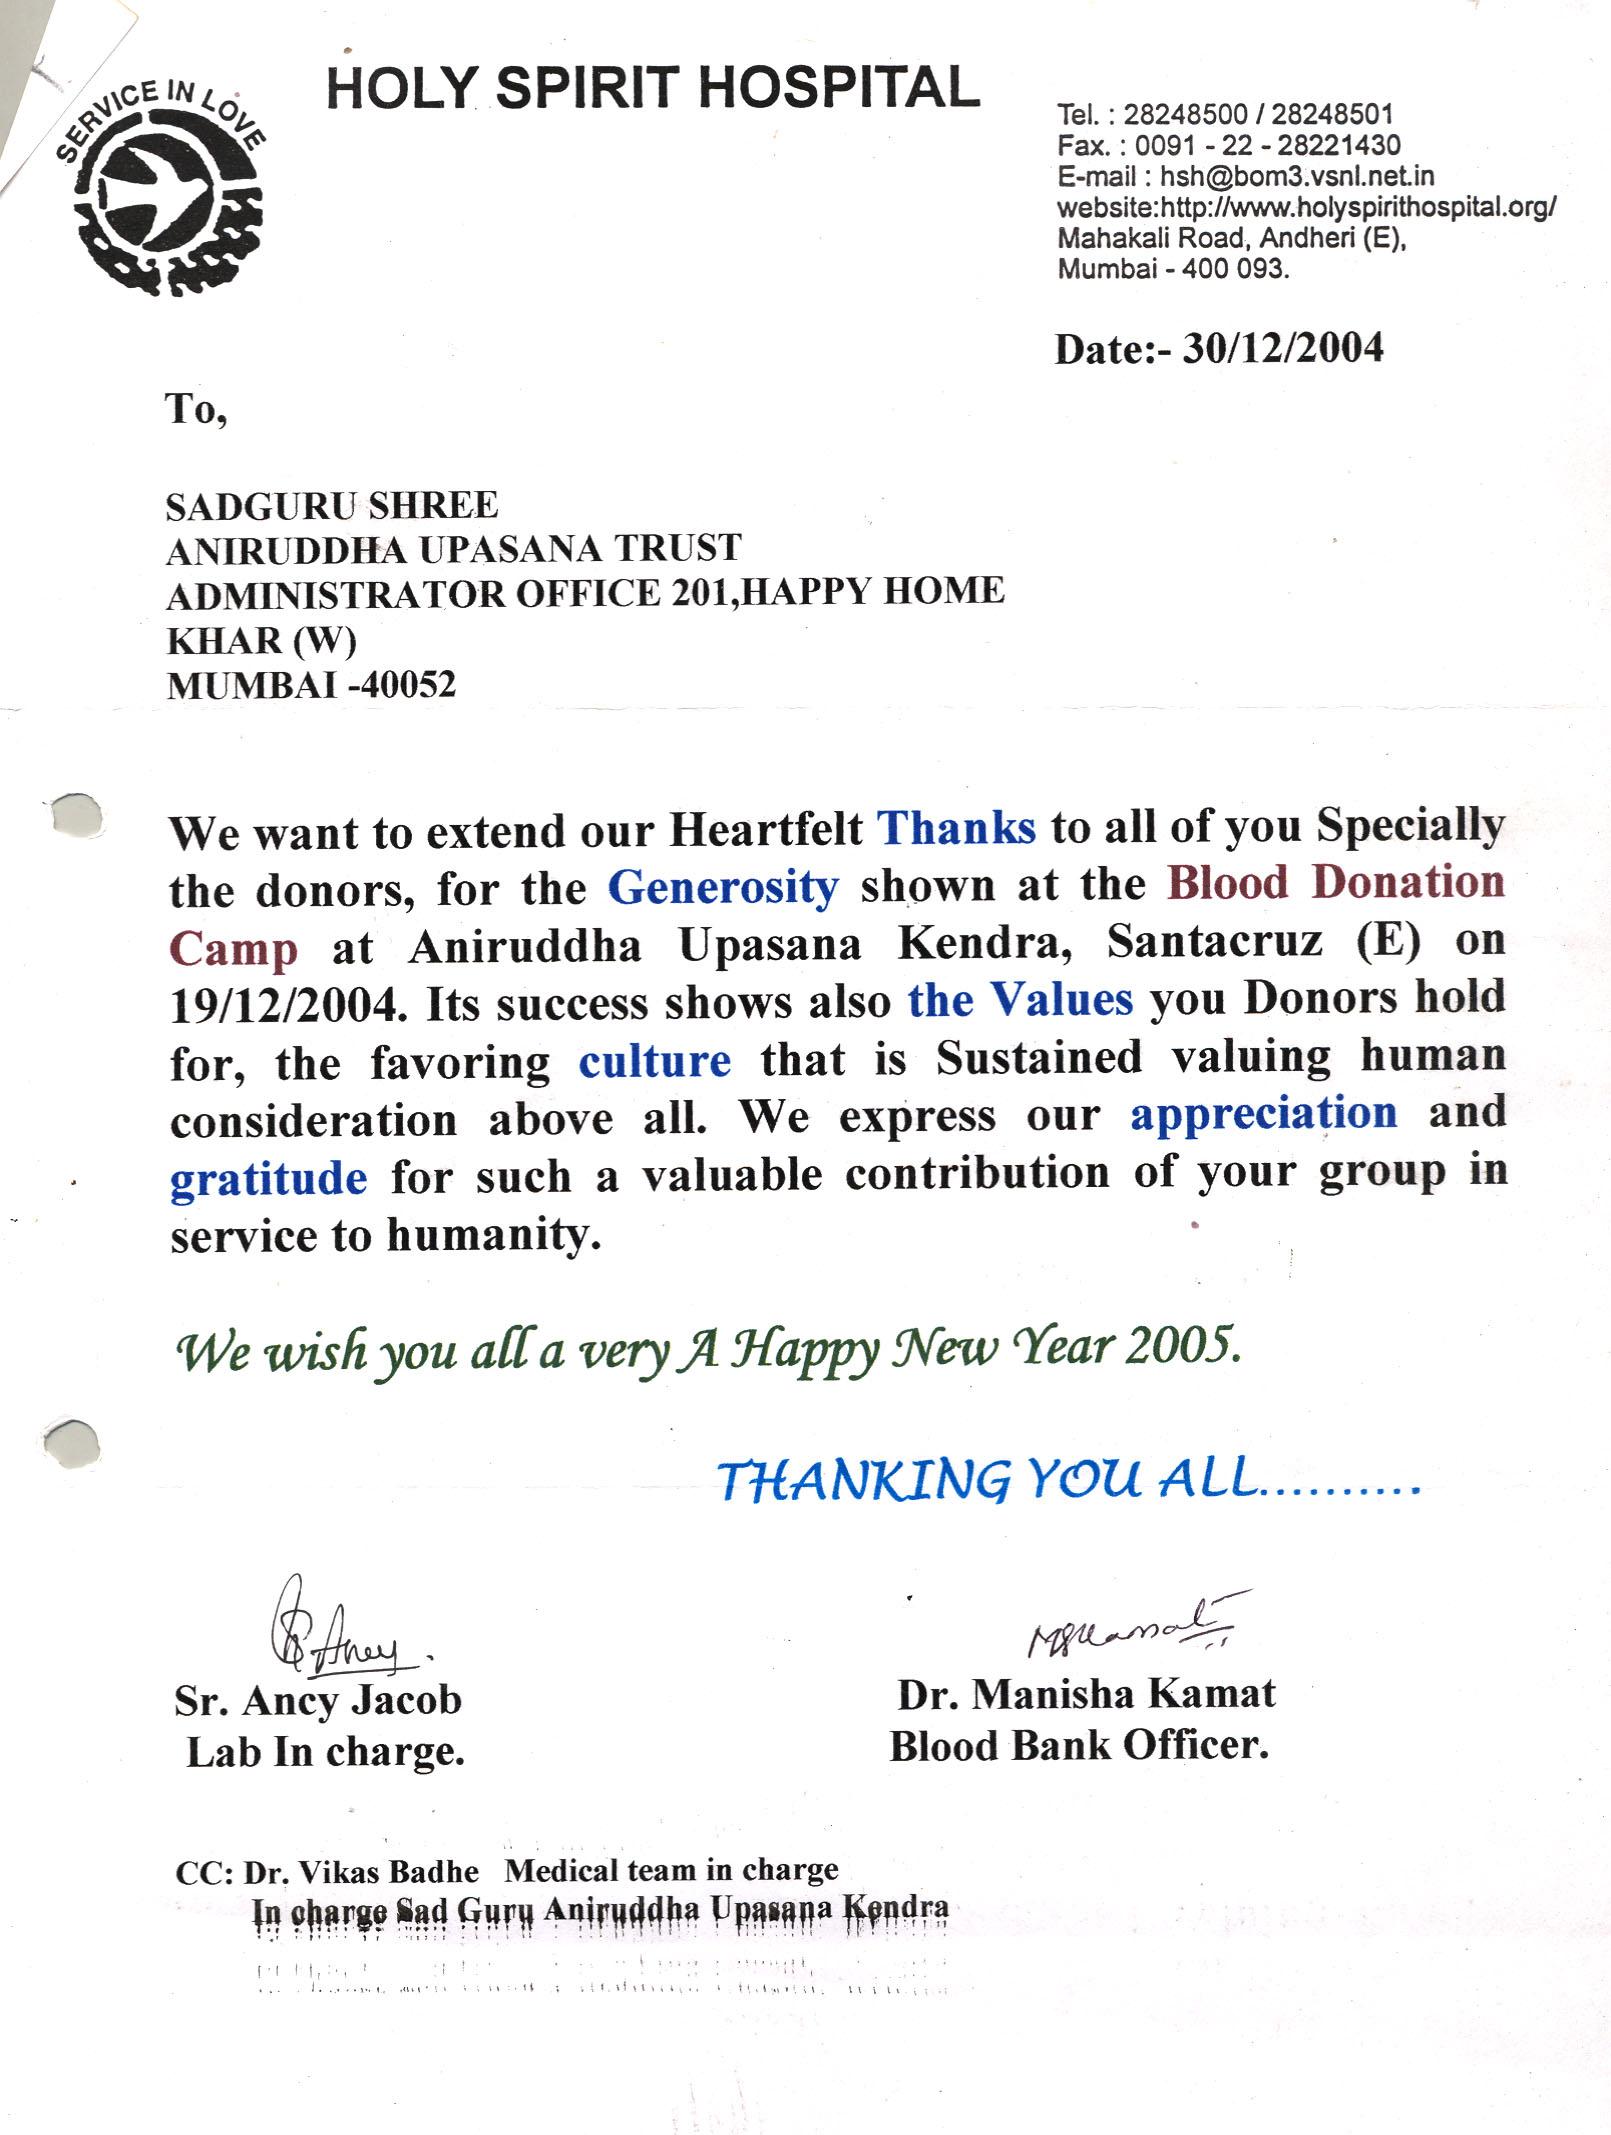 appreciation letter blood donation camps shree aniruddha upasana appreciation letter from holy spirit hospital 2004 for aniruddhafoundation compassion social